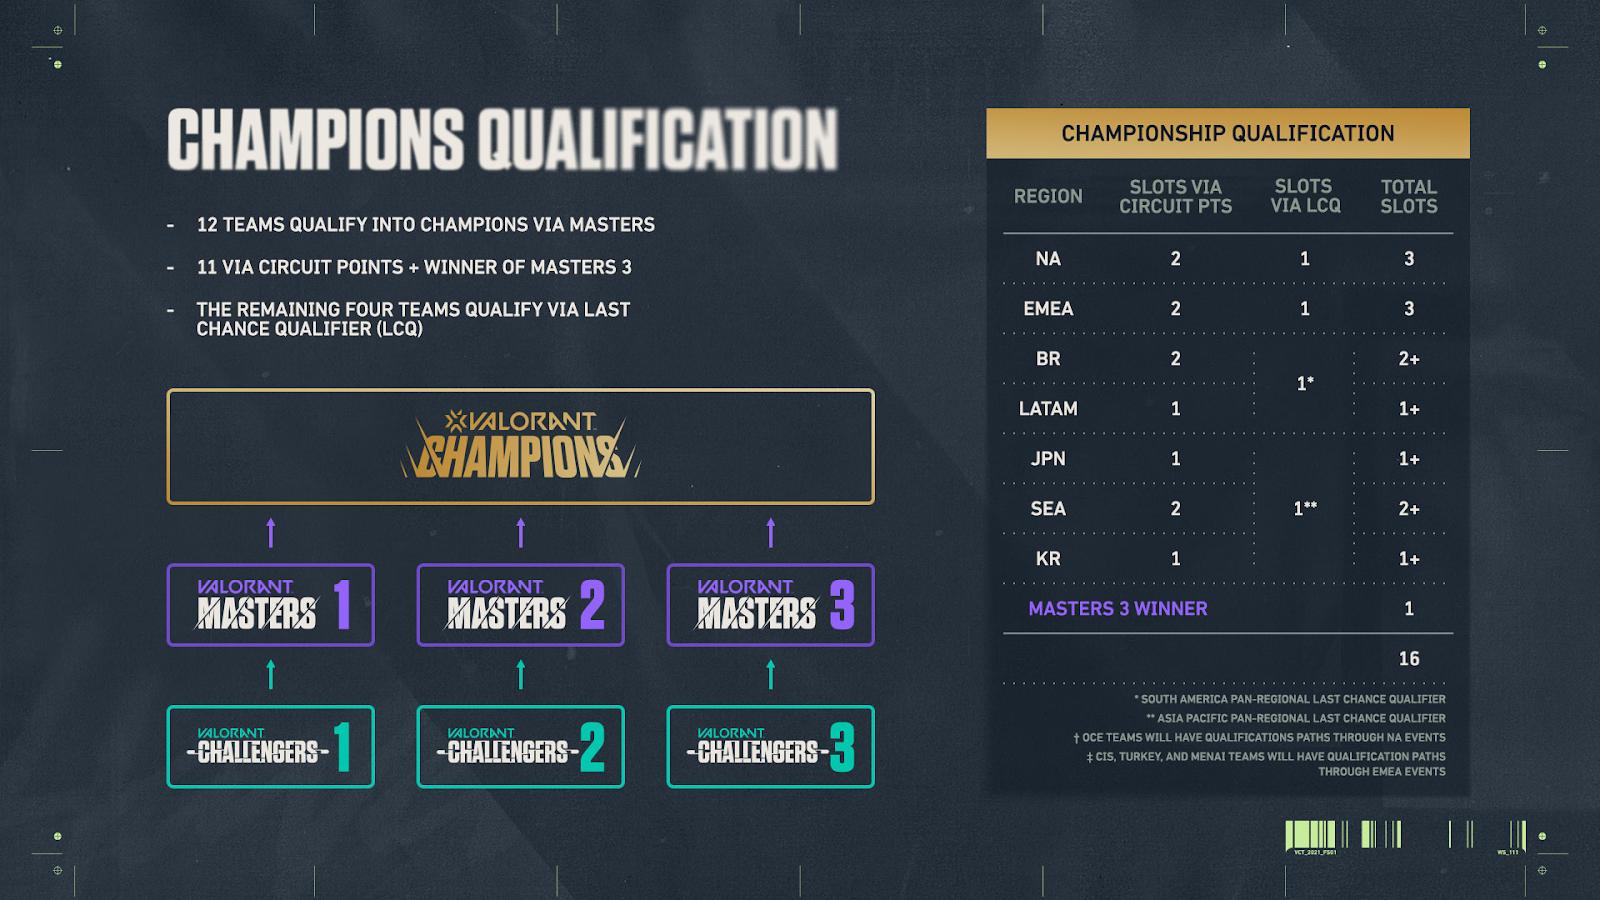 champions qualification